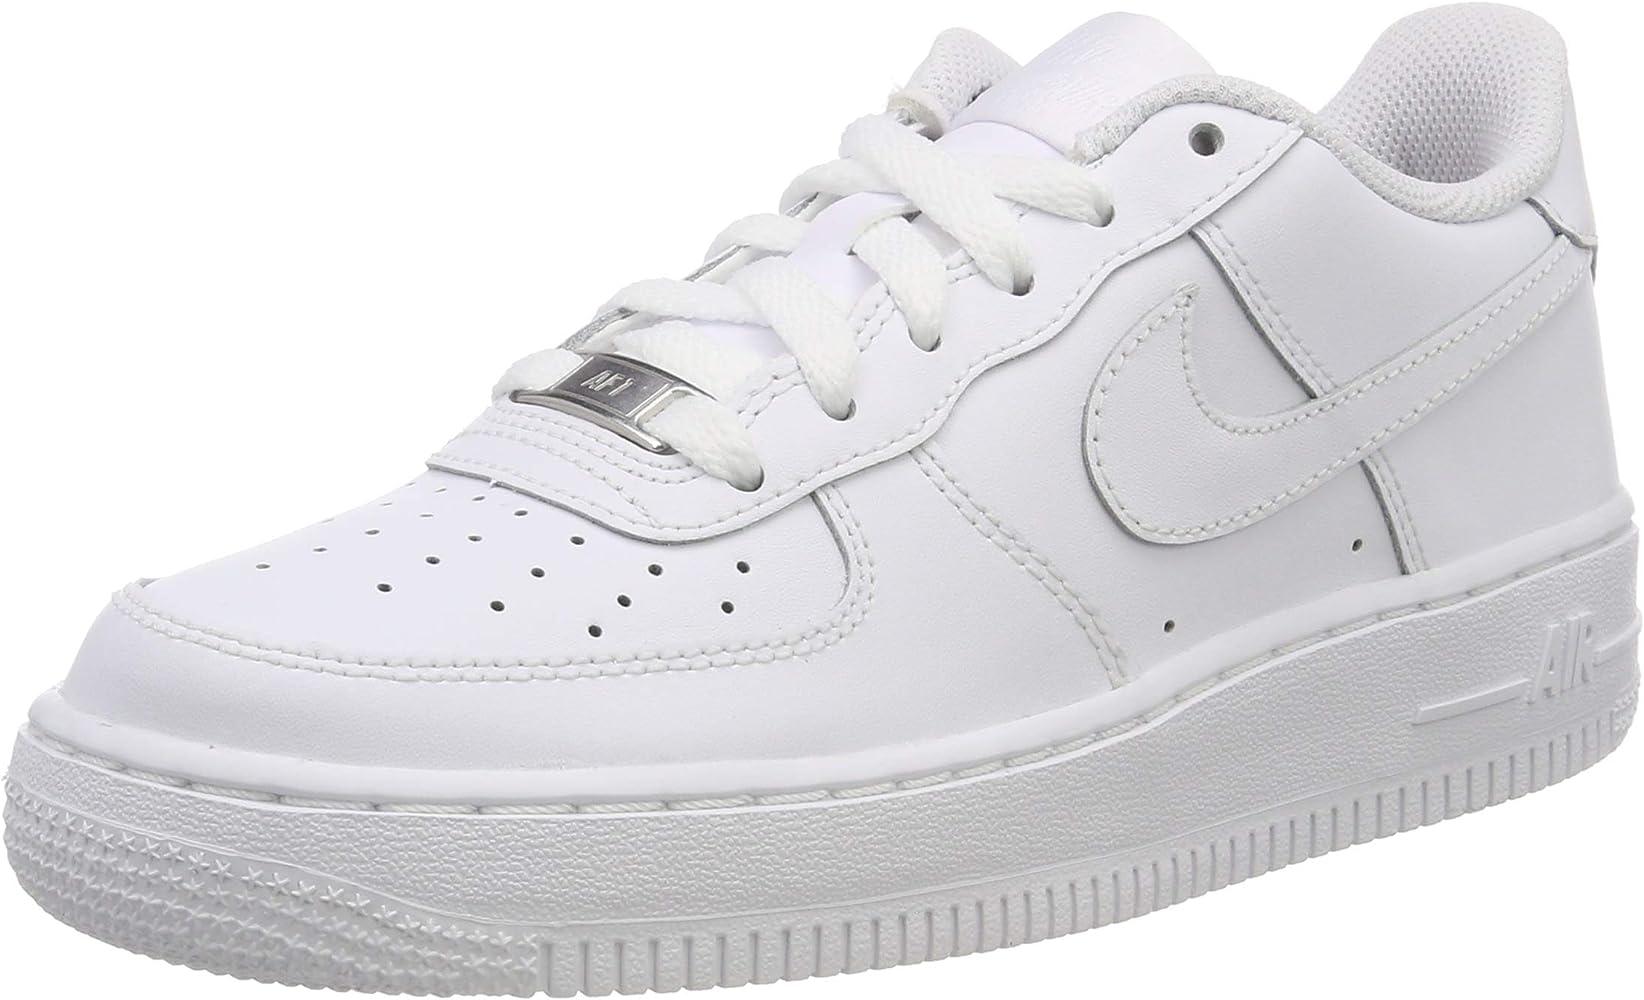 meilleur site web b61fd ab4d3 Nike Air Force 1 (Gs), Chaussures de sport garçon, Blanc ...